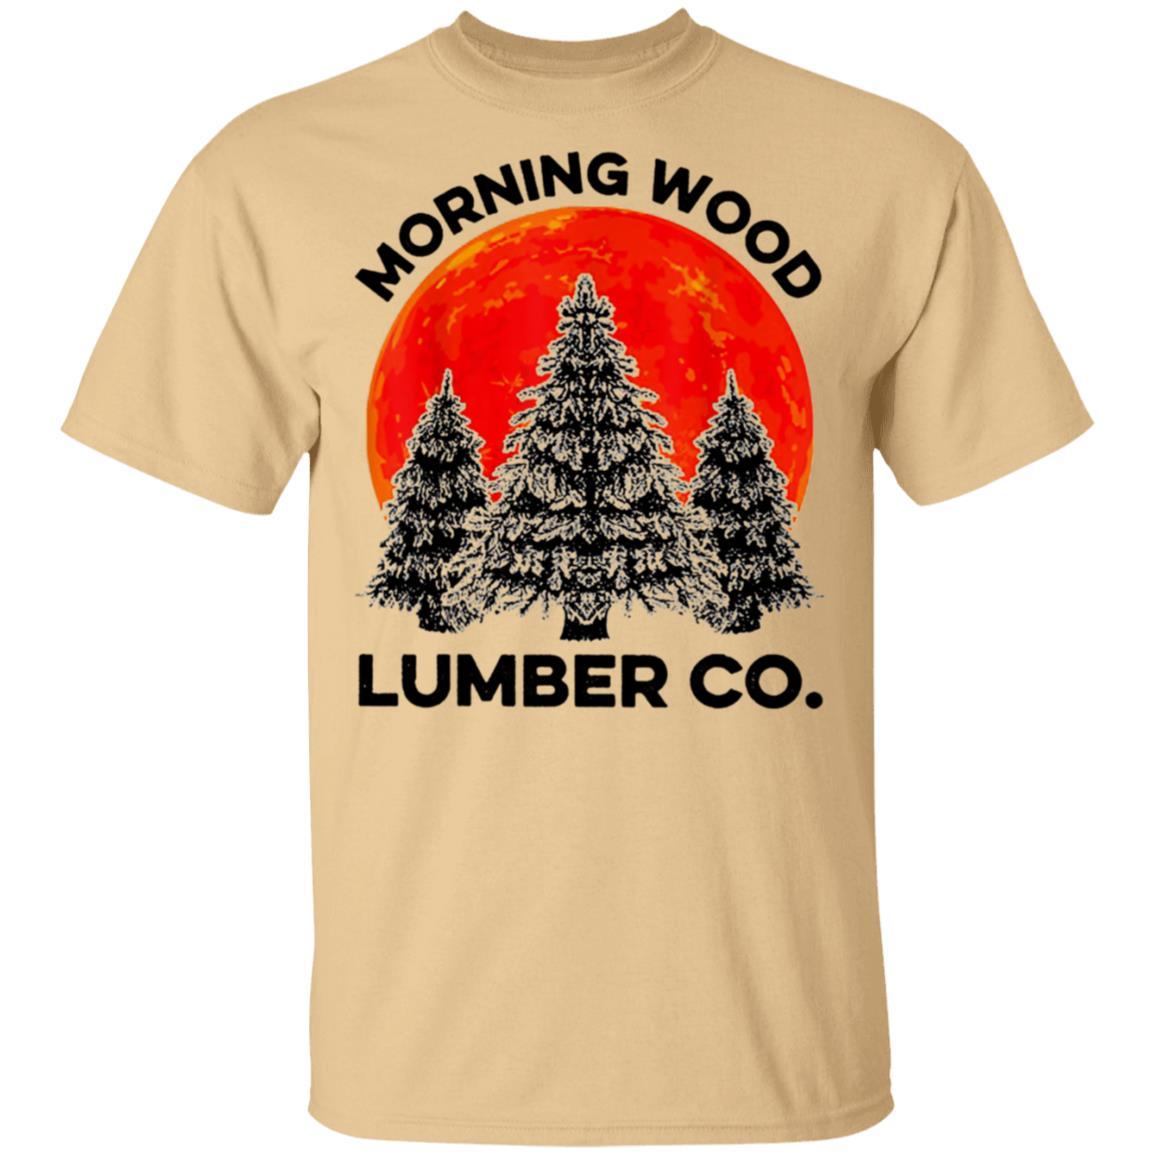 Morningwood Lumber Kids Jersey Raglan T-Shirt Children 3//4 Sleeve Baseball Shirt Top